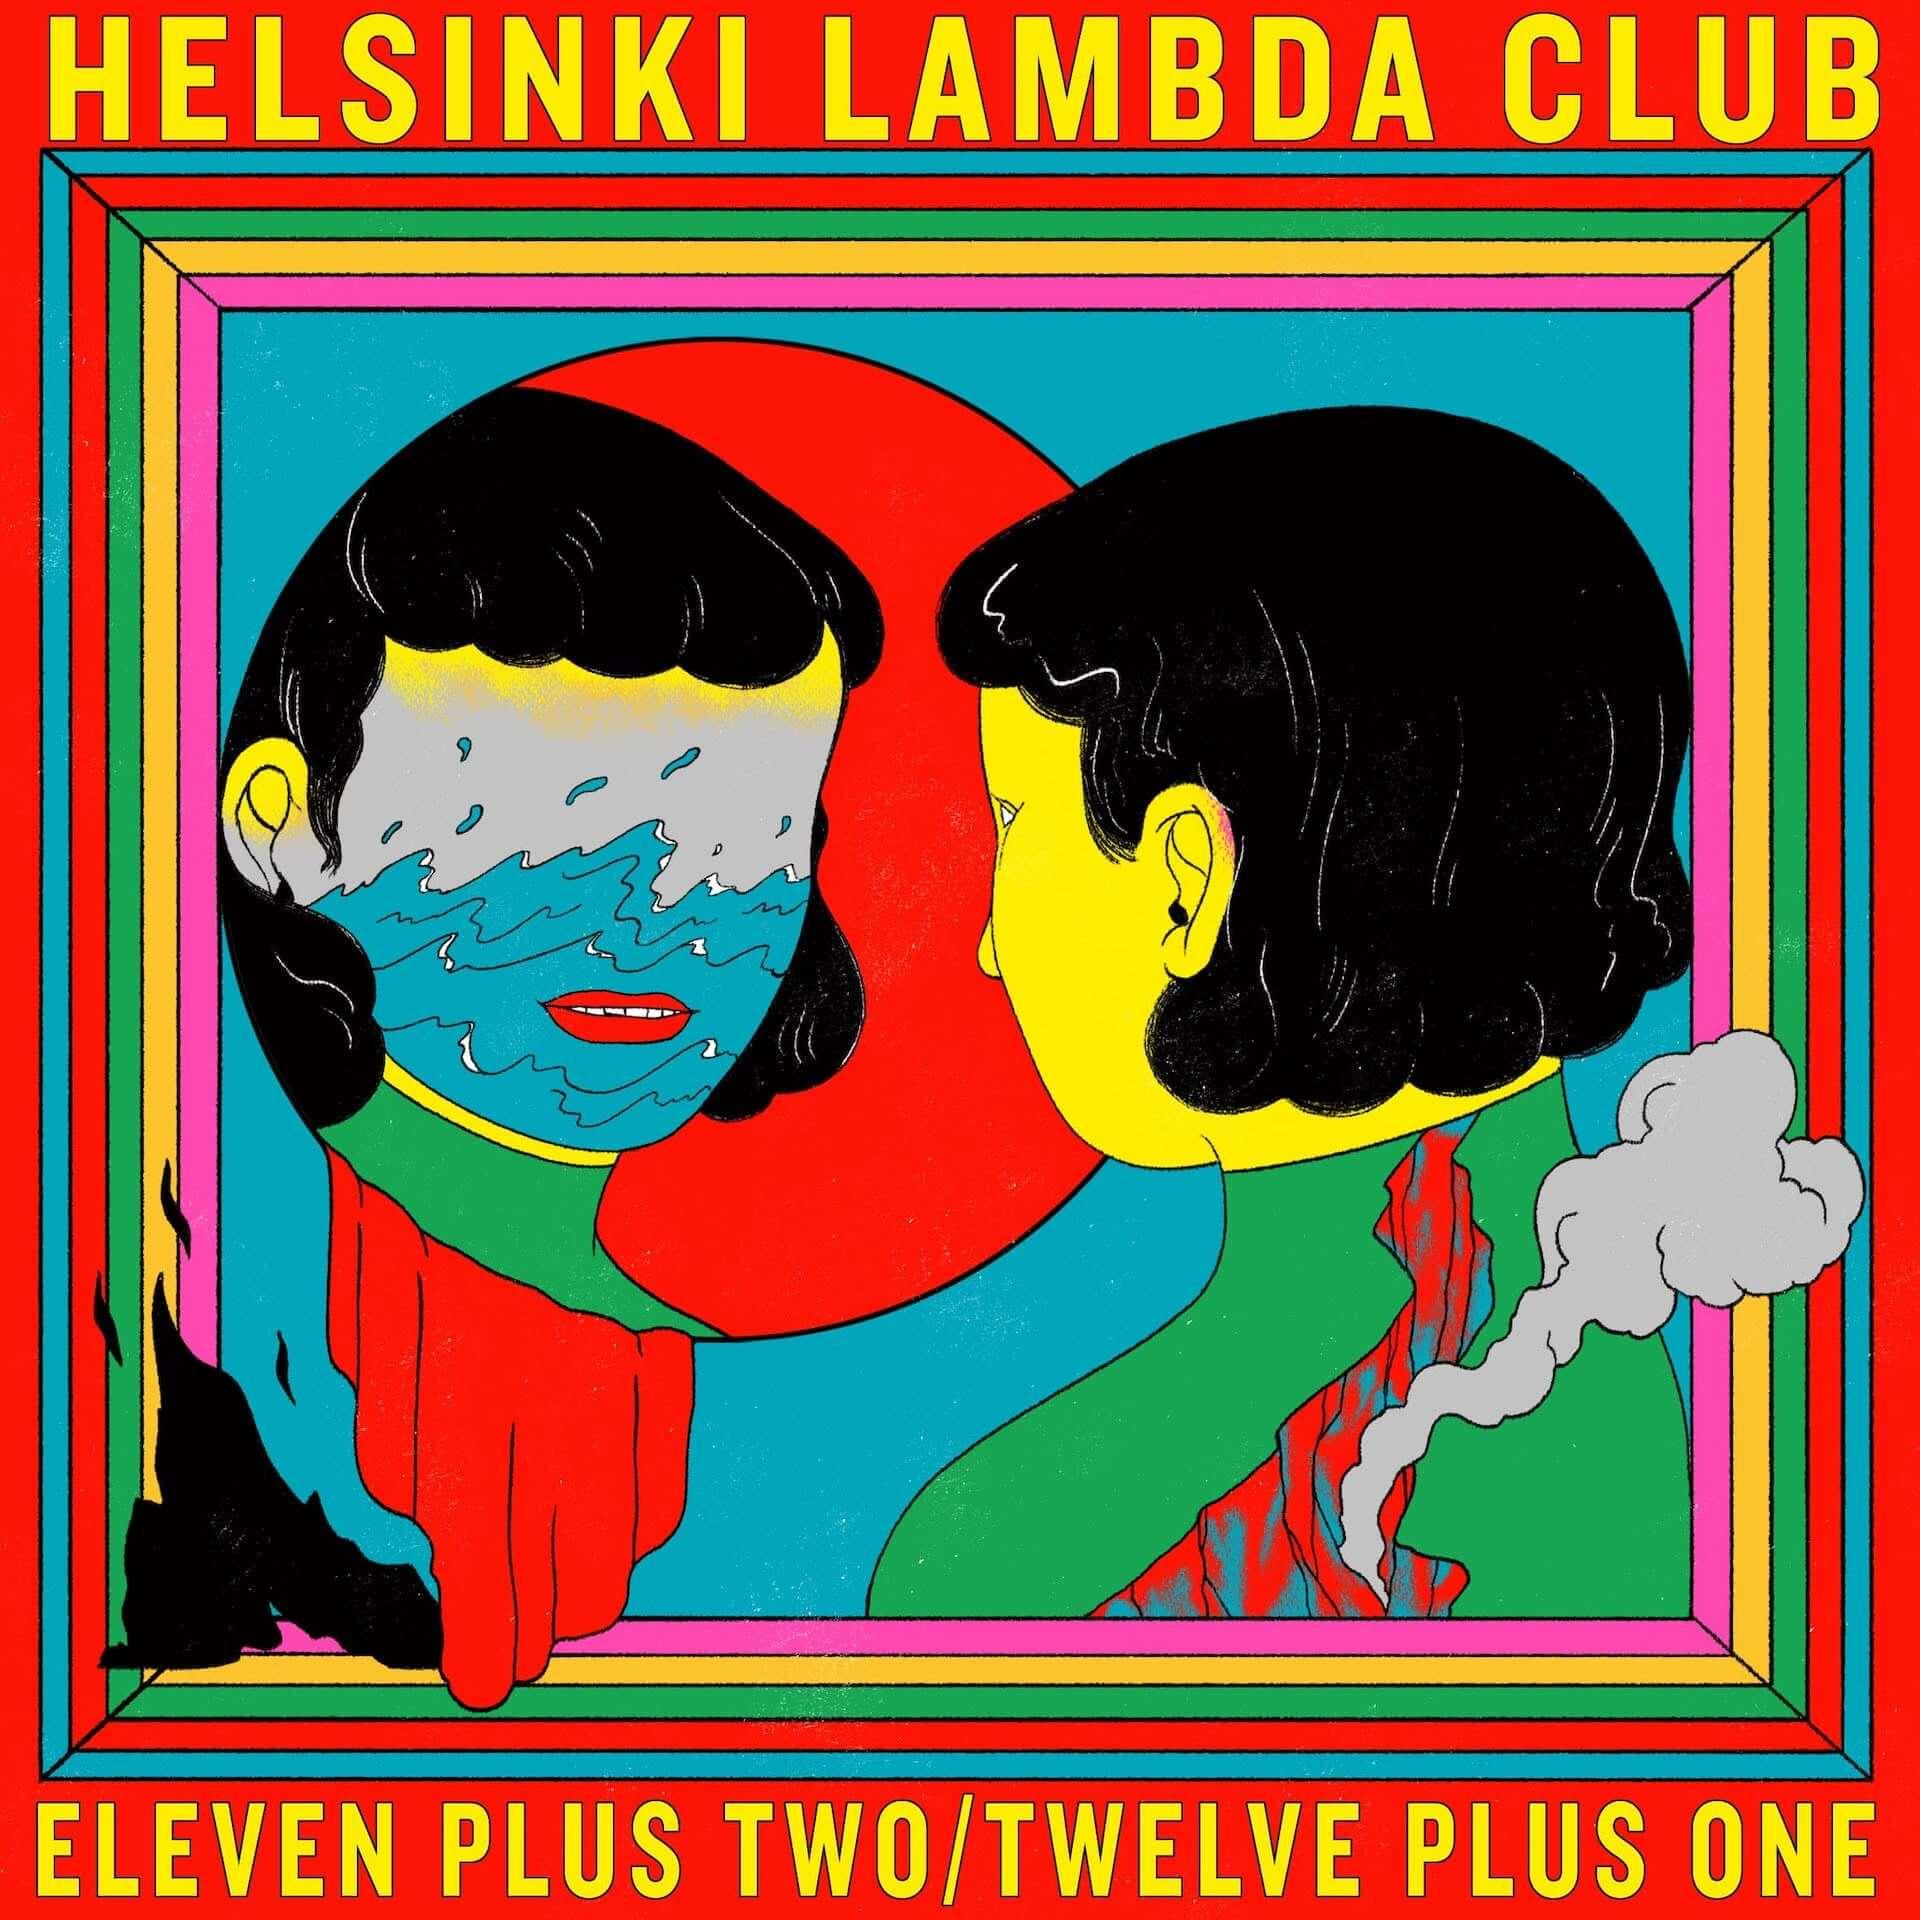 "Helsinki Lambda Club最新作より""眠ったふりして""のMVが本日公開!主演には有村藍里が抜擢 music201104_helsinki-lambda-club_2-1920x1920"